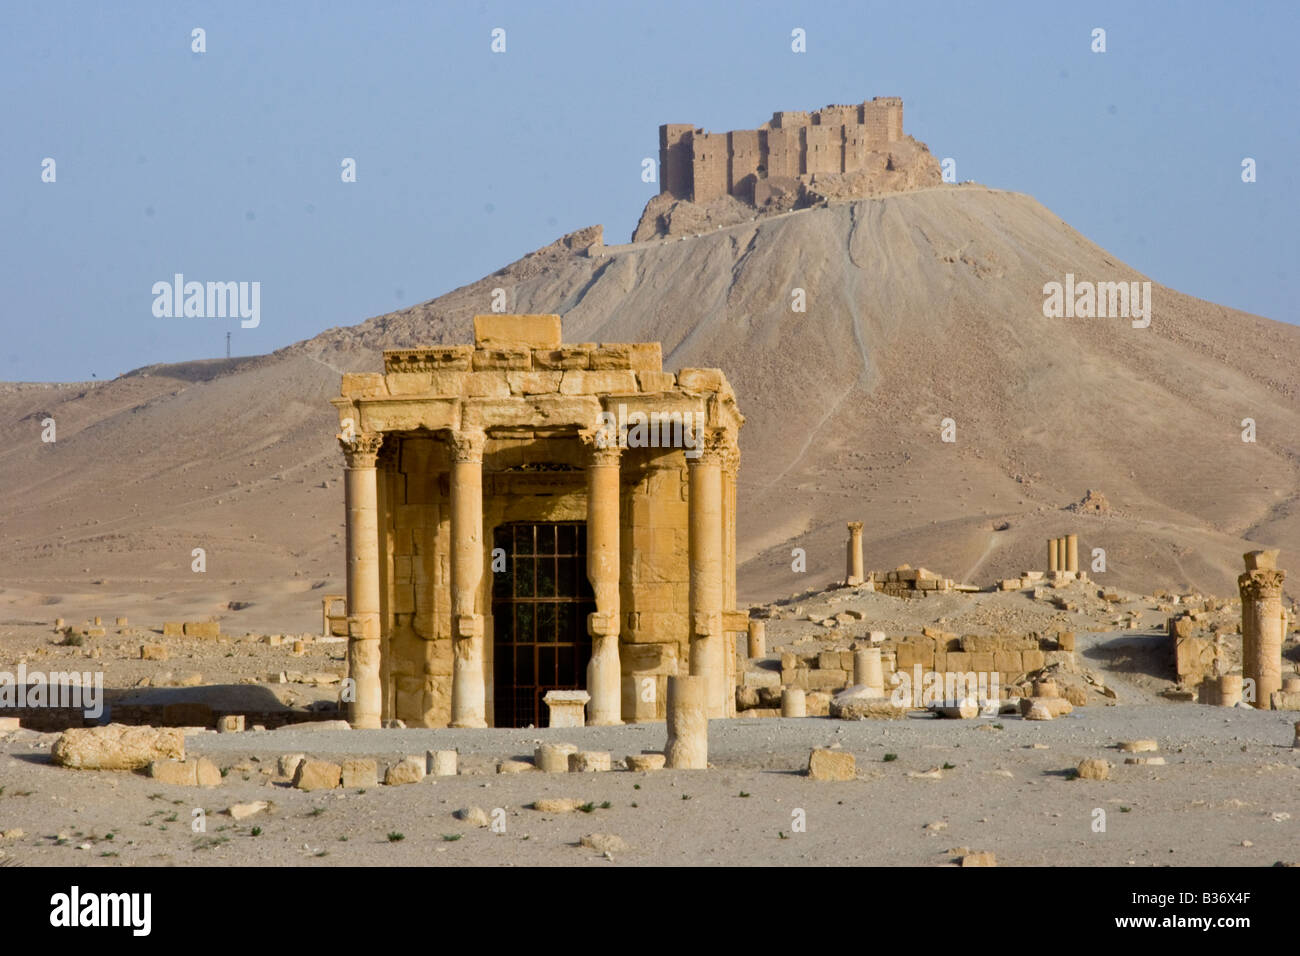 Roman Temple of Baal-Shamin and Arab Castle Qalaat Ibn Maan in Palmyra Syria - Stock Image